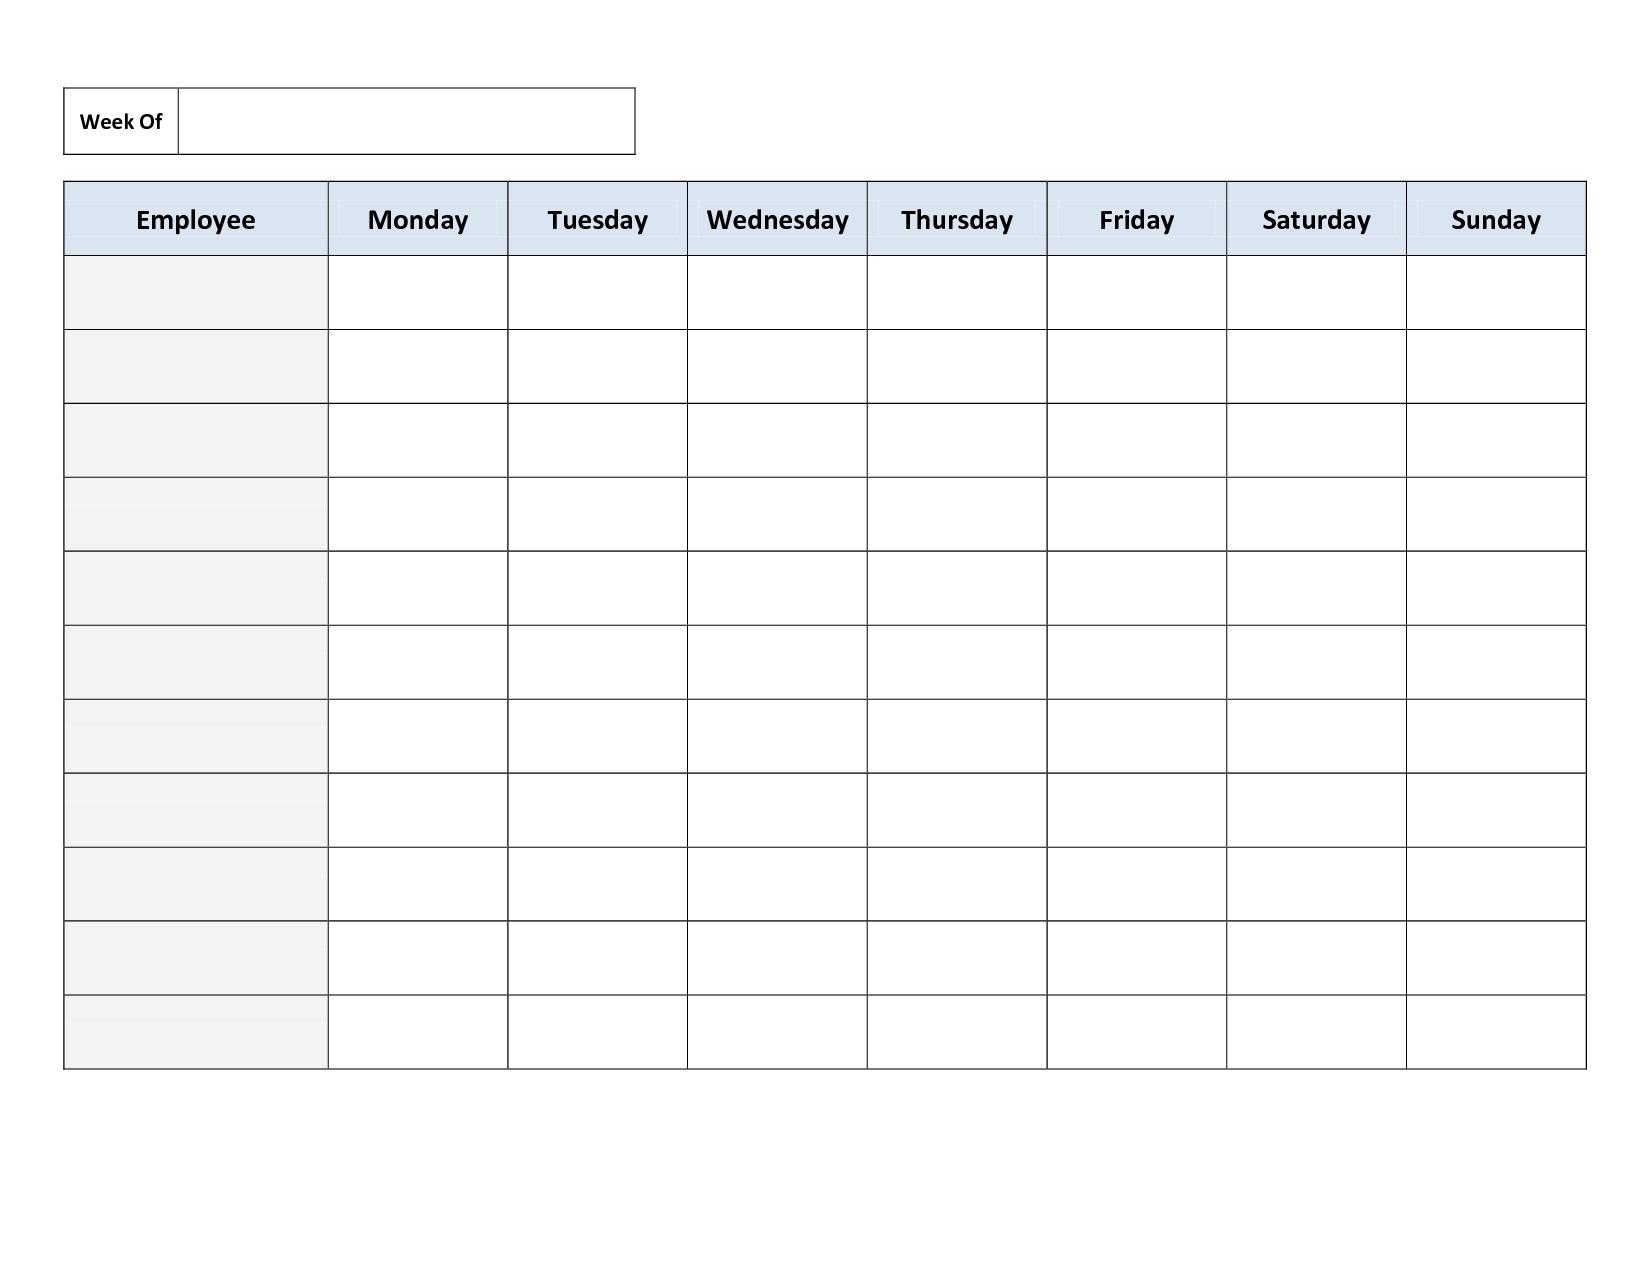 Blank Weekly Work Schedule Template   Schedule   Cleaning Schedule - Free Printable Blank Weekly Schedule